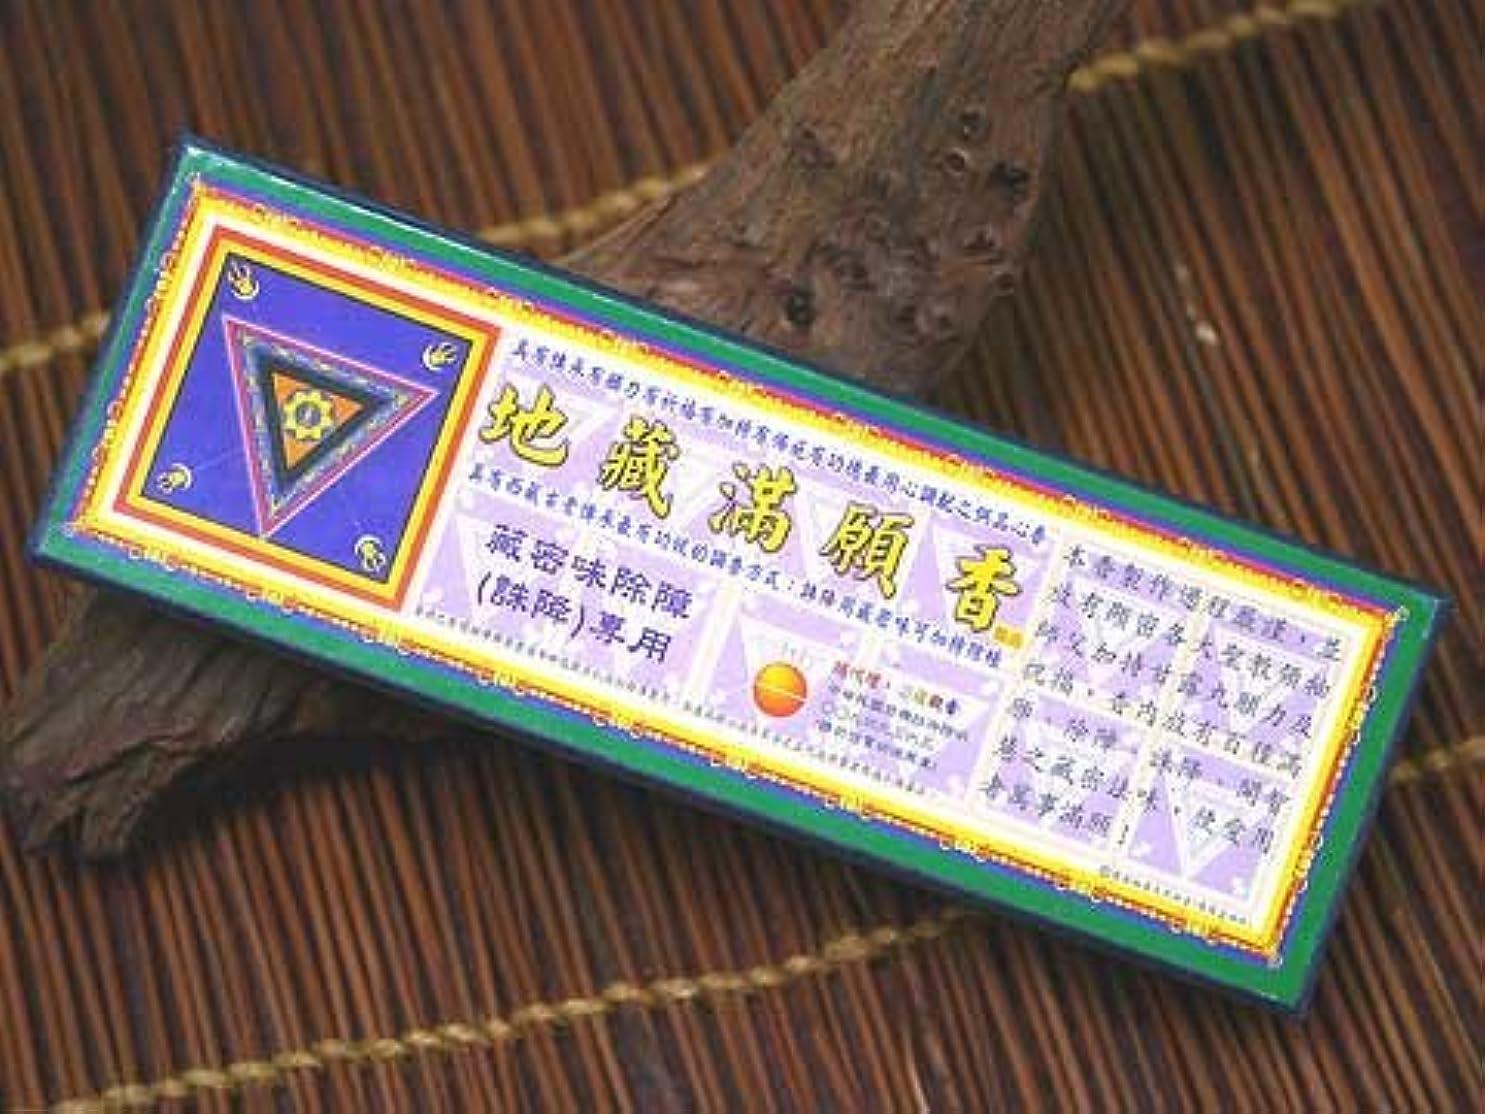 乙女絶壁聖書地蔵満願香 台湾のお香 彩蓮観音 地蔵満願香 おタイプ